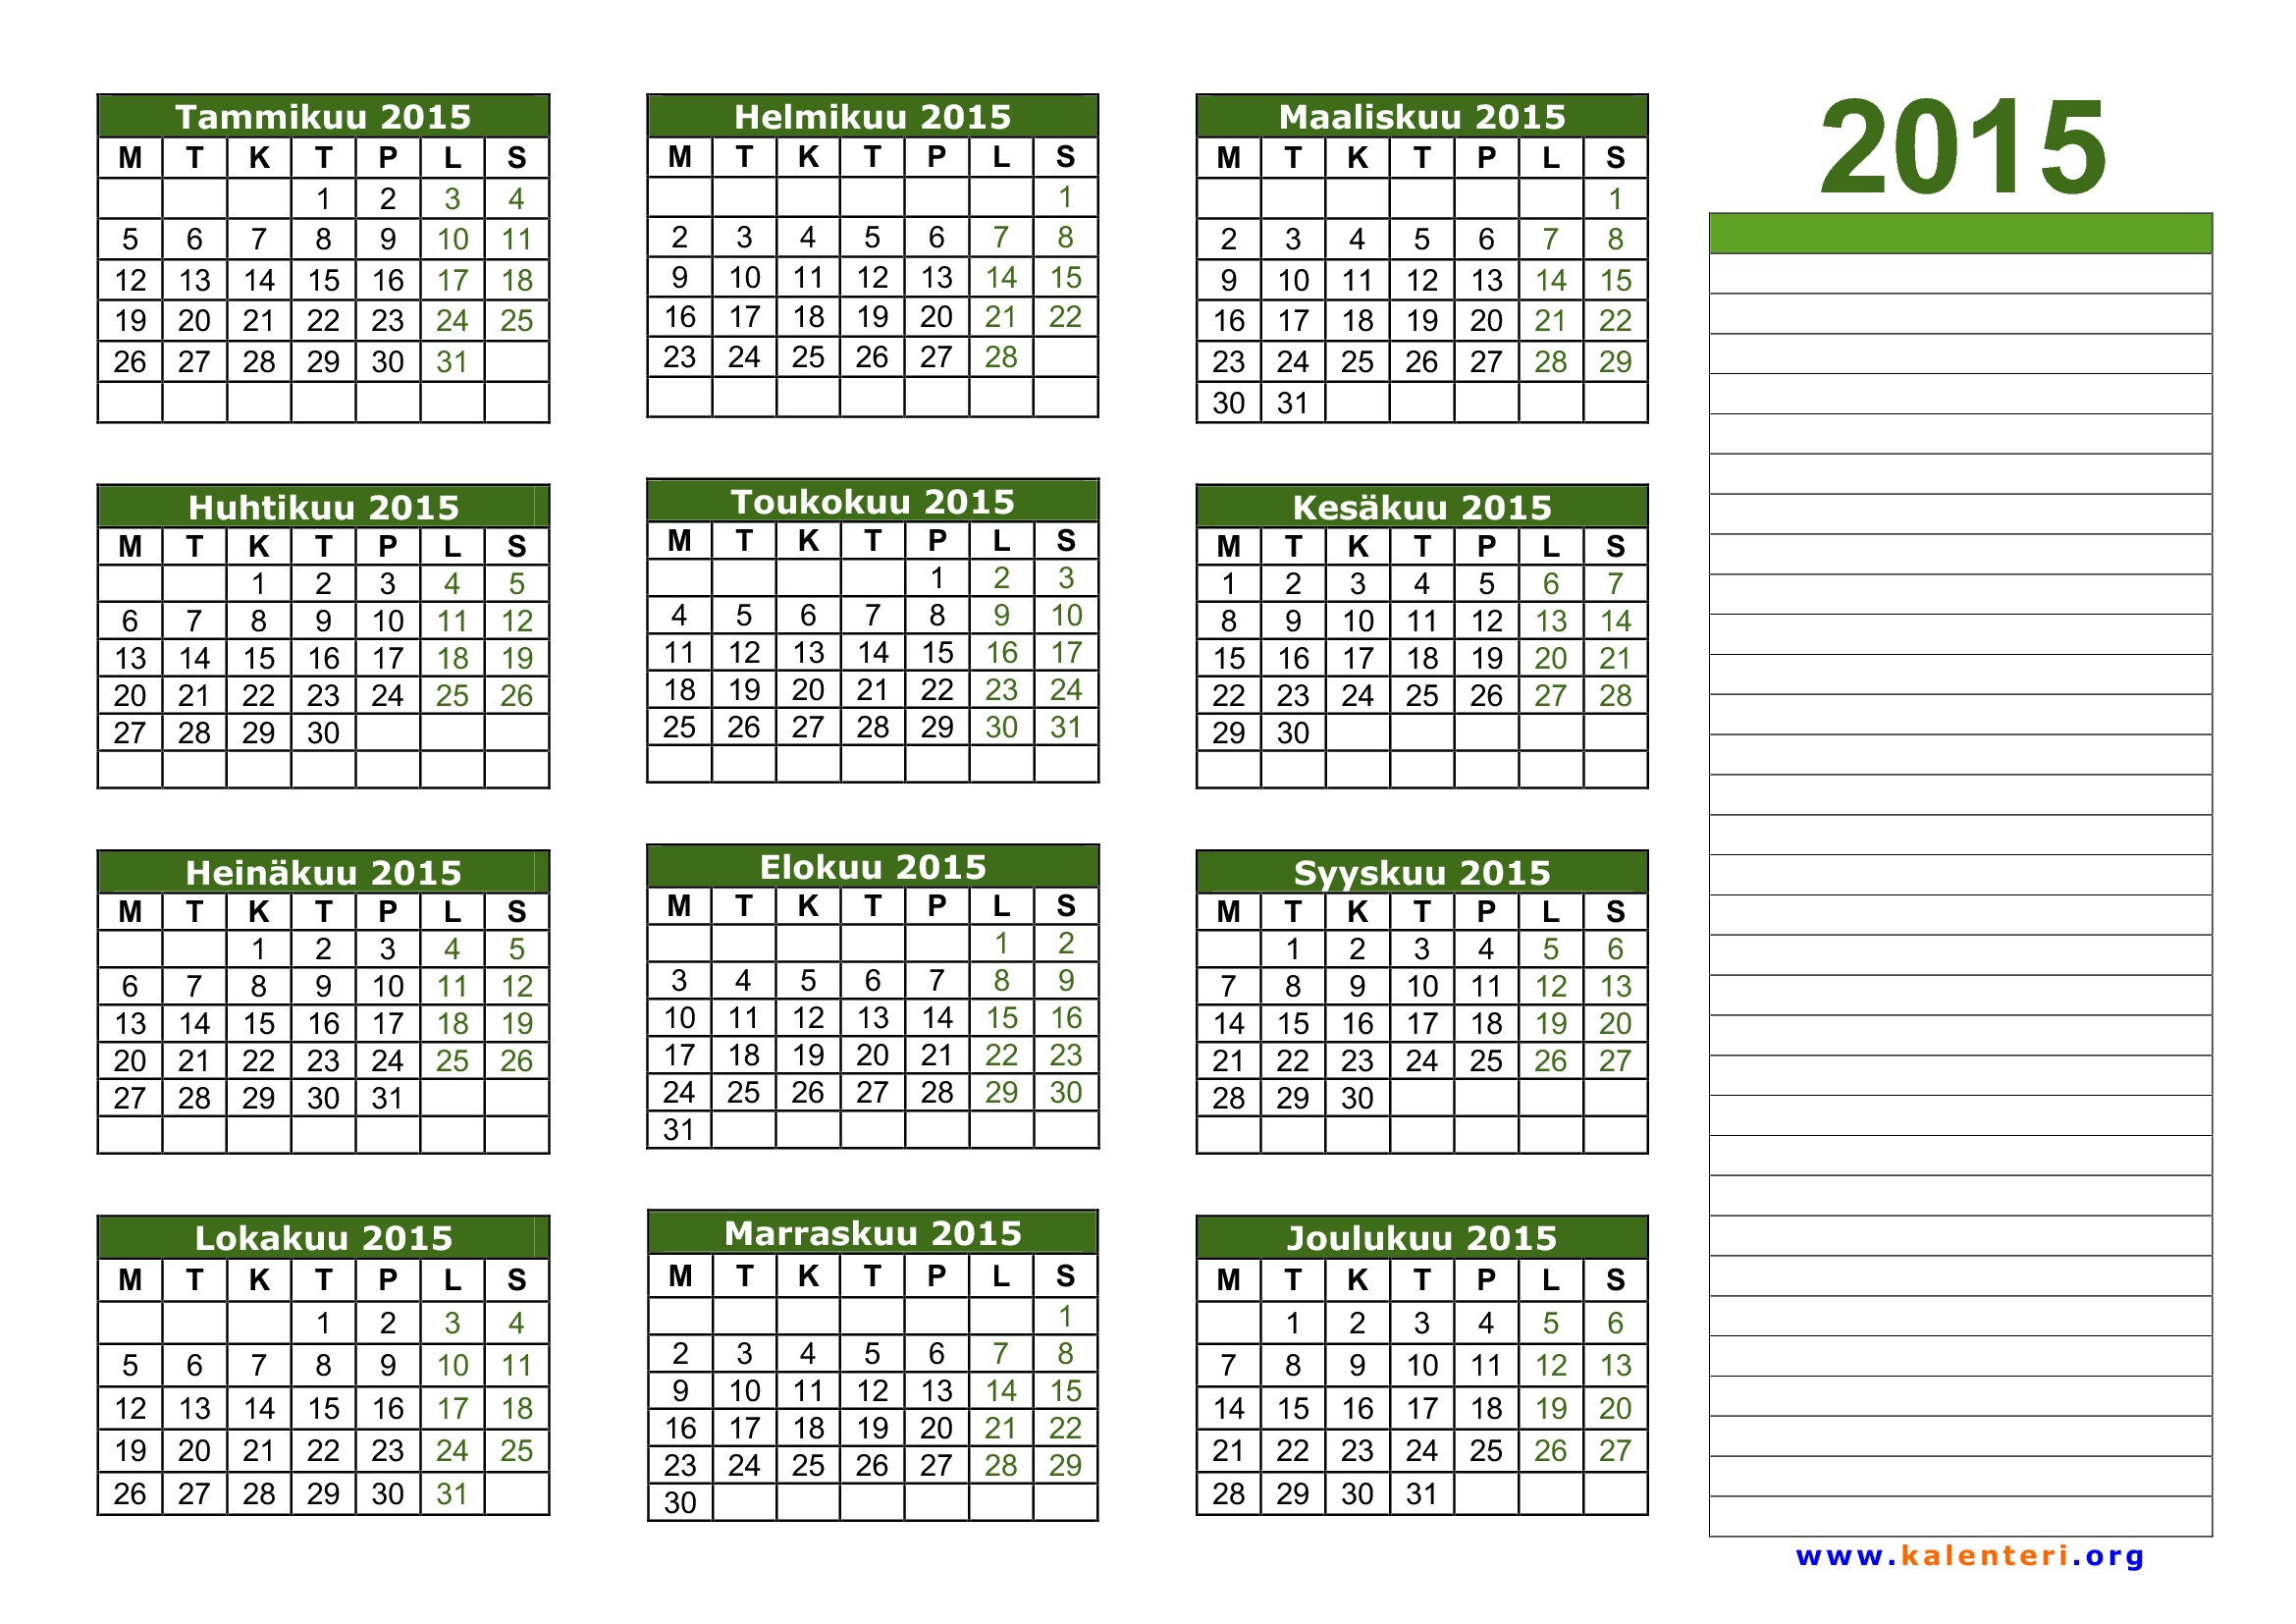 Calendario Para Imprimir 2019 Janeiro Actual 2019 2018 Calendar Printable with Holidays List Kalender Kalendar Of Calendario Para Imprimir 2019 Janeiro Más Recientemente Liberado Root